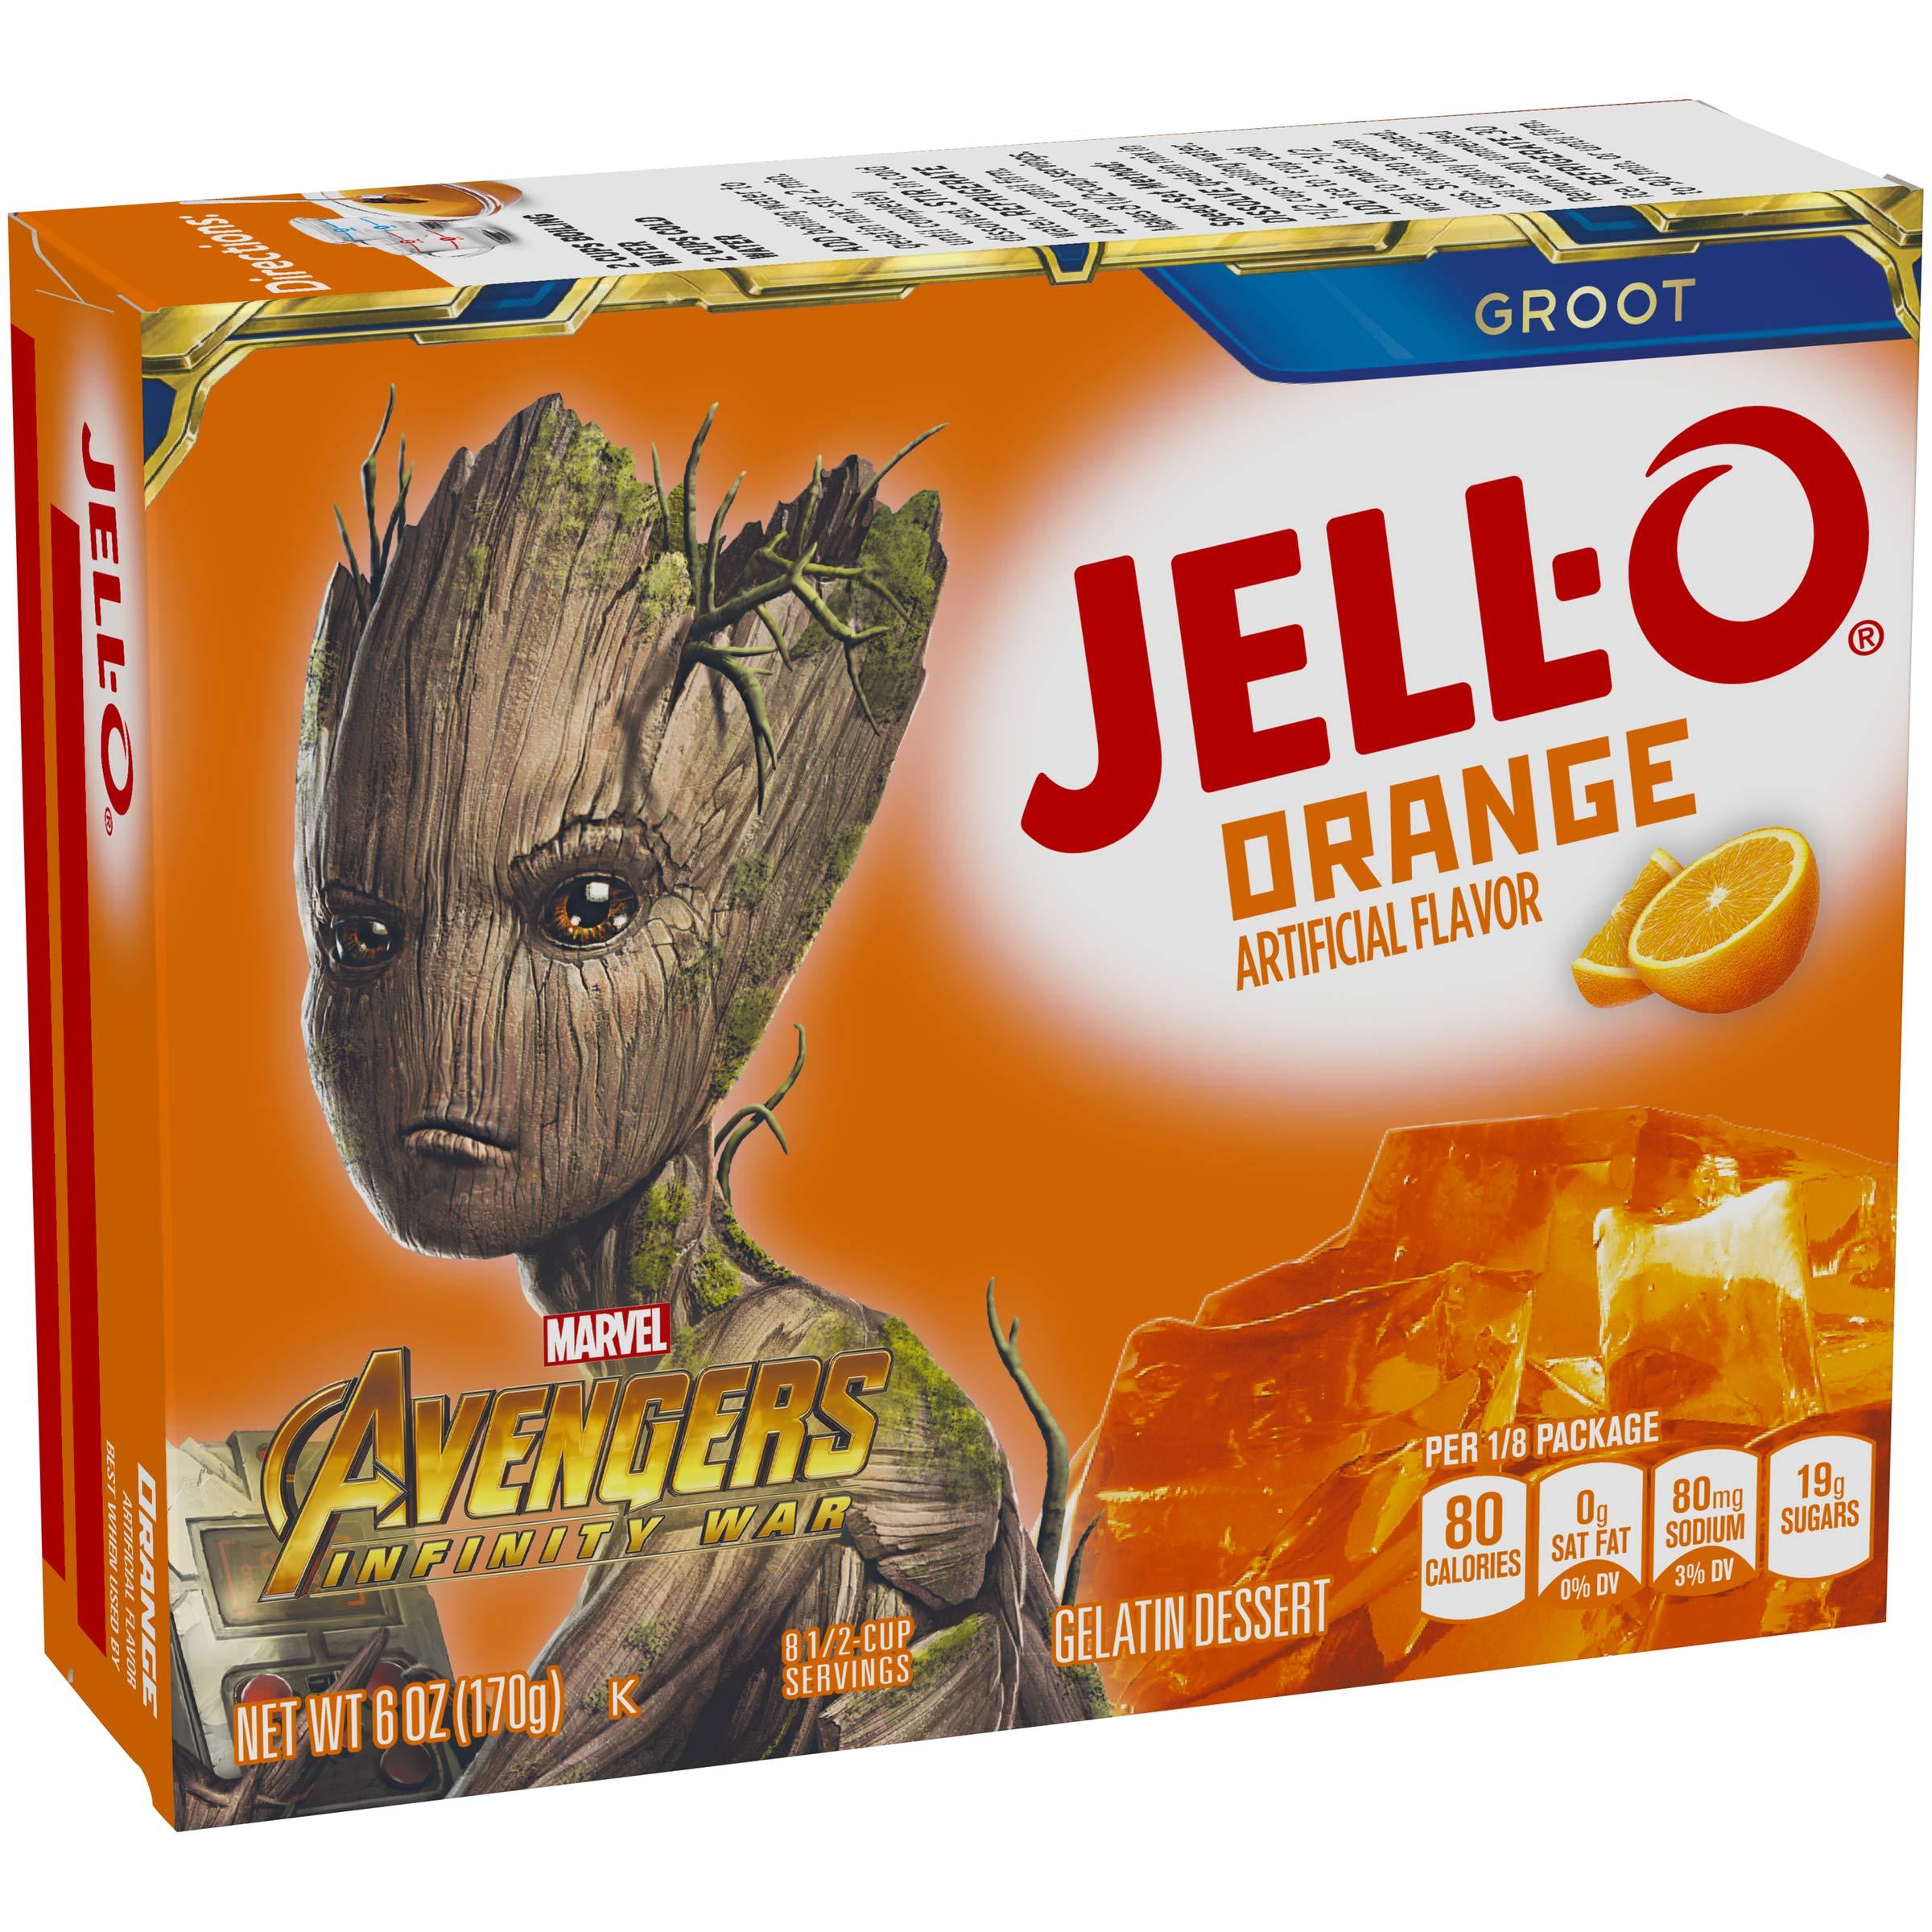 Jell-O Orange Gelatin Dessert Mix, 6 oz Box by Jell-O (Image #6)